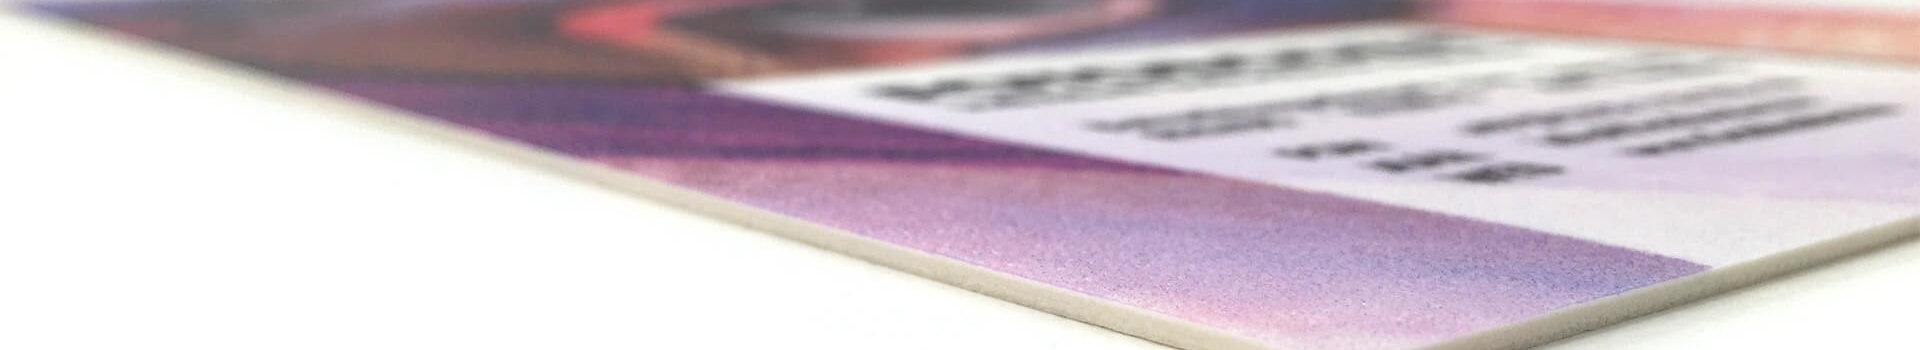 Vinylboden bedruckt